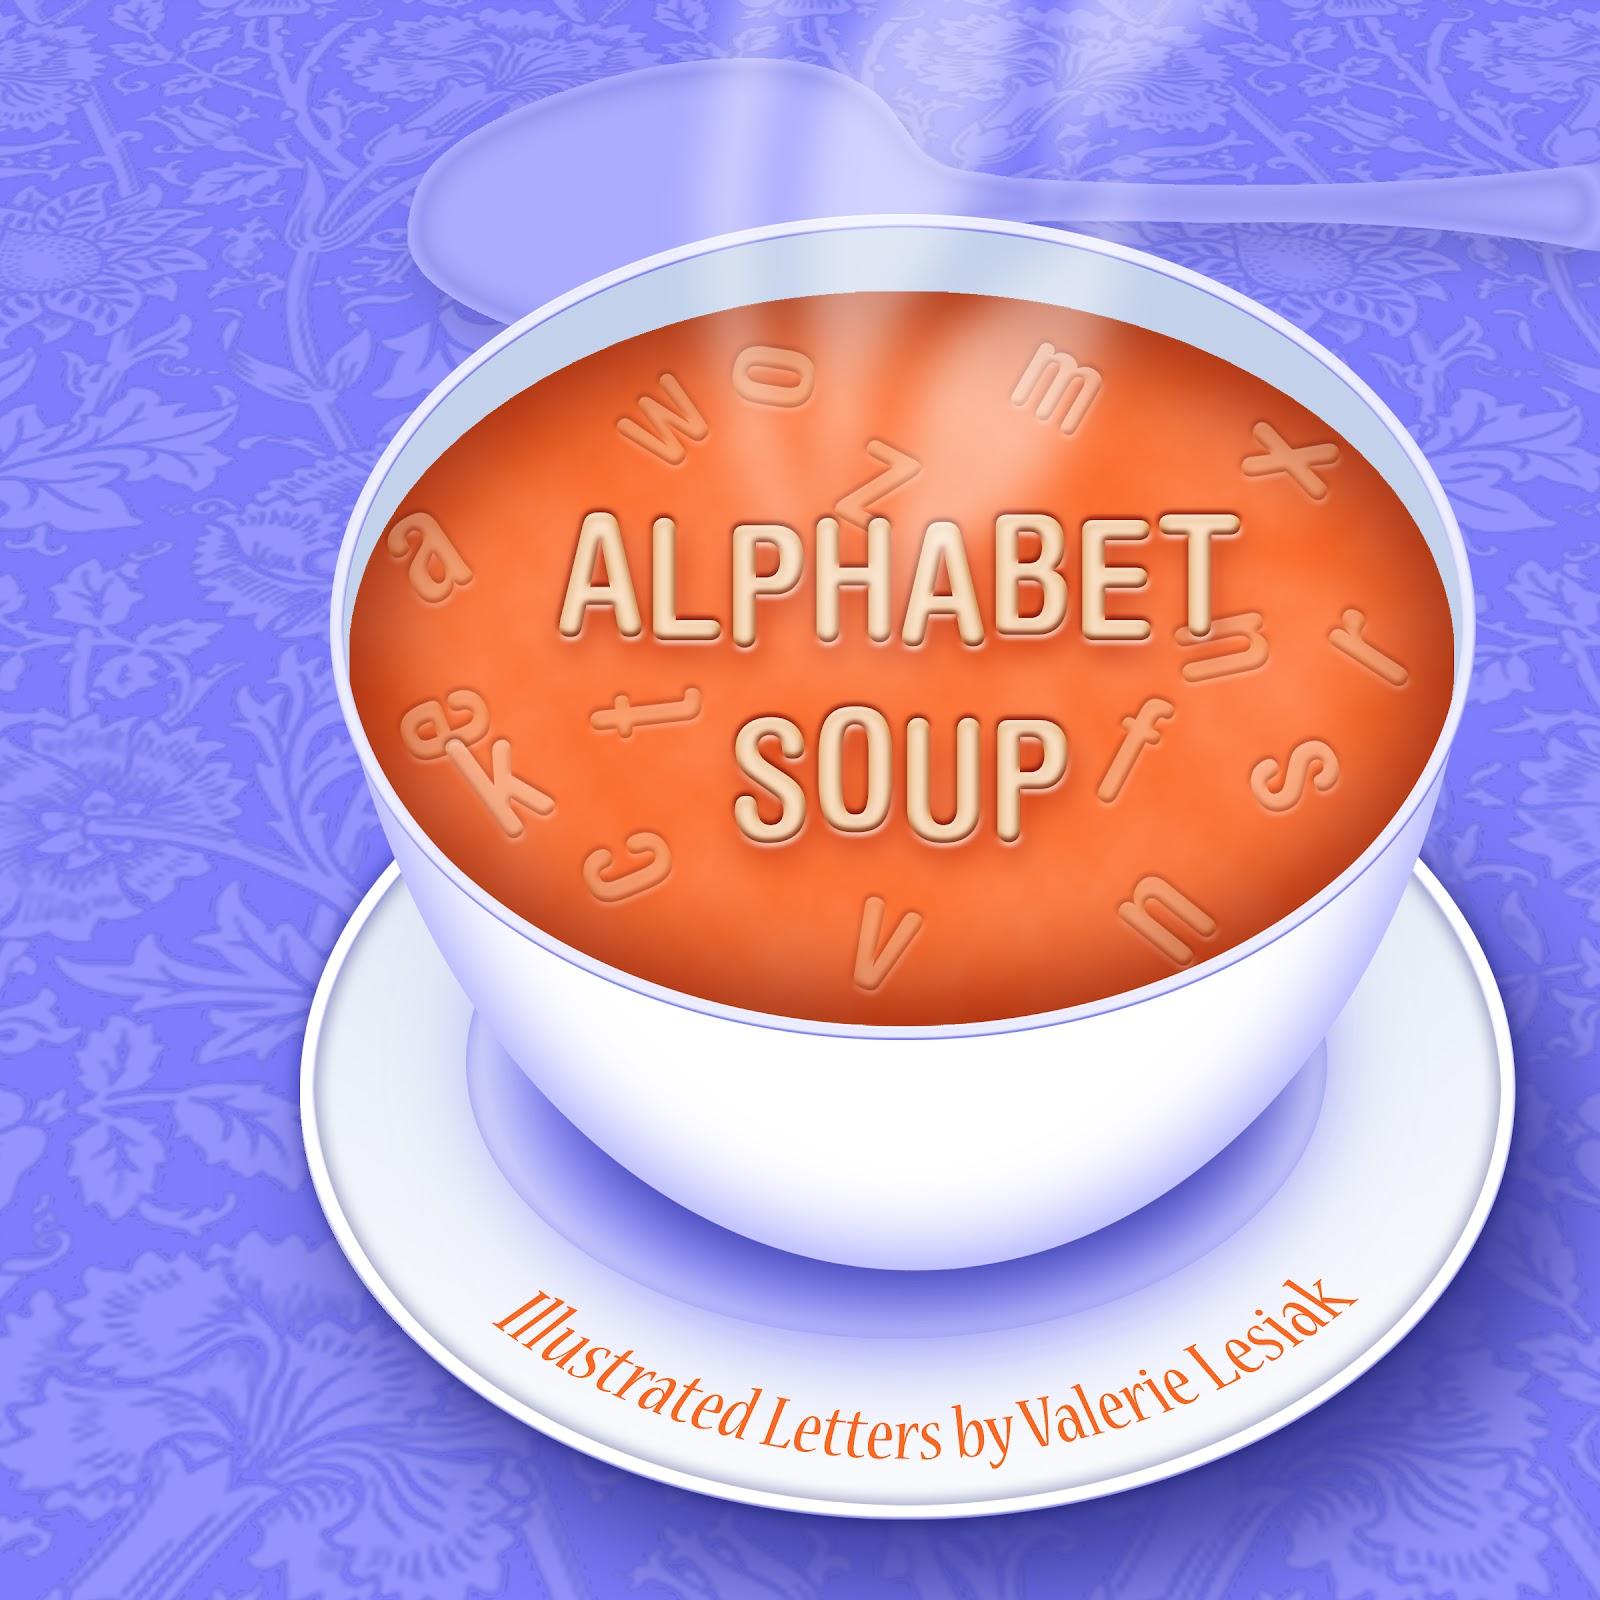 Soup clipart alphabet soup Clipart Soup Clipart (18+) alphabet